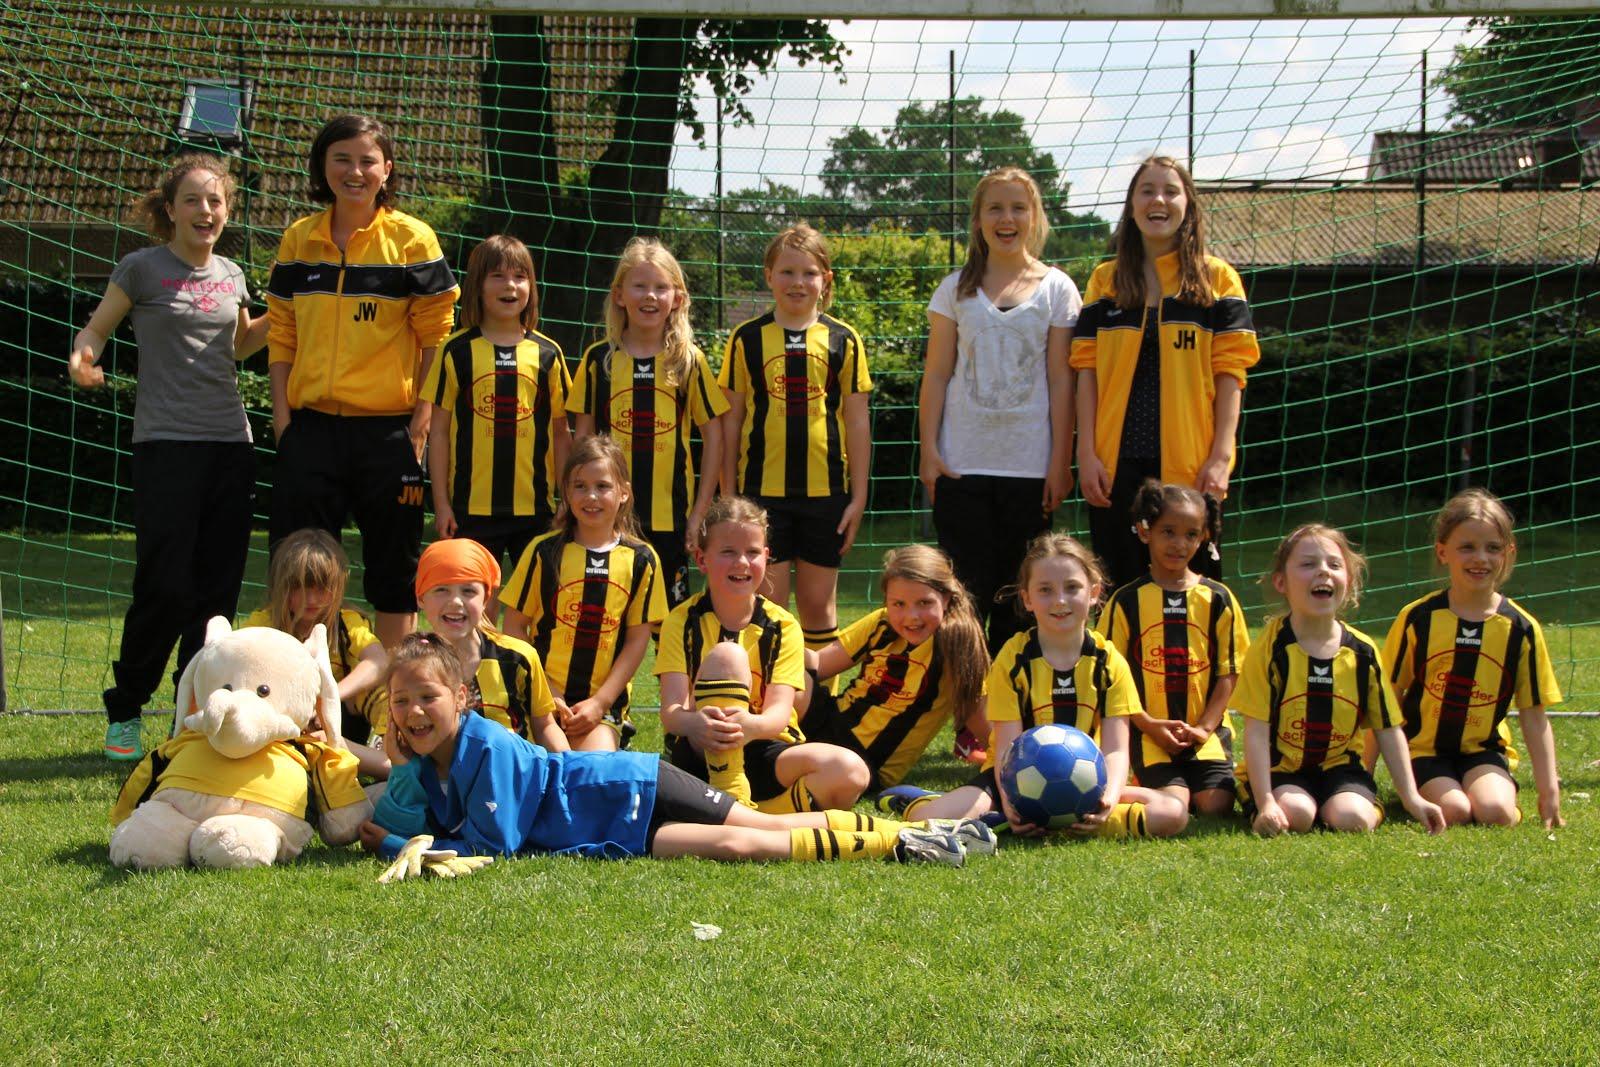 Team F2 Mädchen Feld 2013/2014